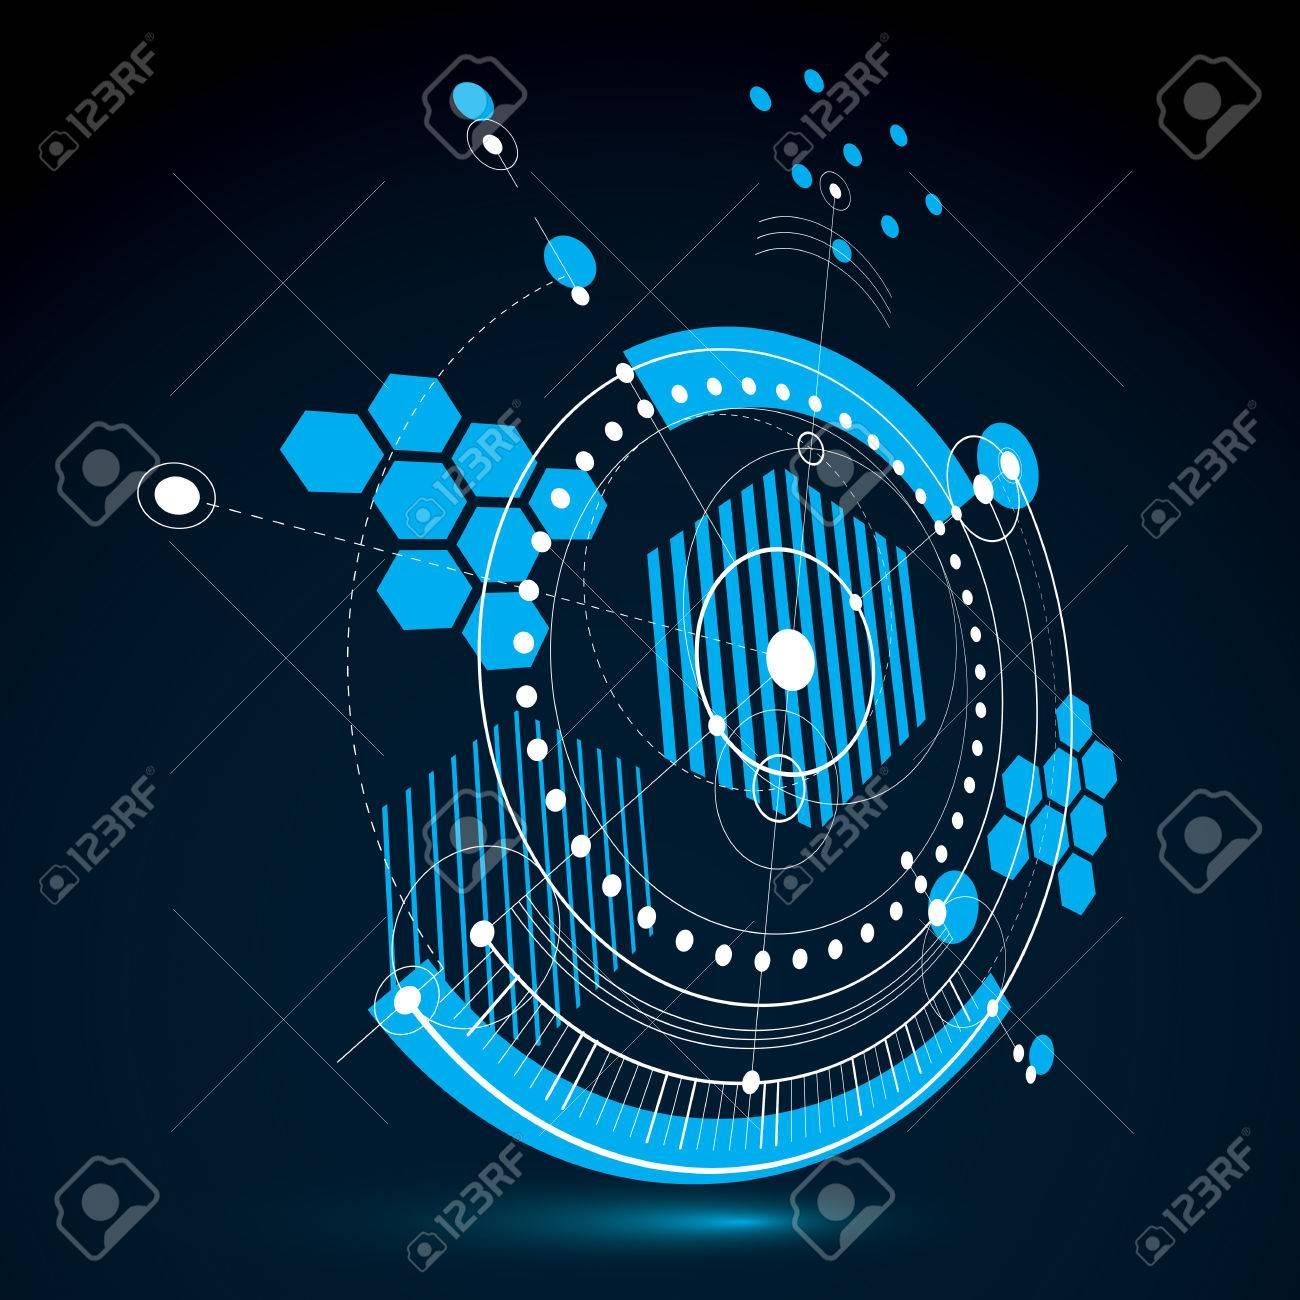 Technical blueprint blue vector digital background with geometric technical blueprint blue vector digital background with geometric design elements circles 3d illustration malvernweather Image collections